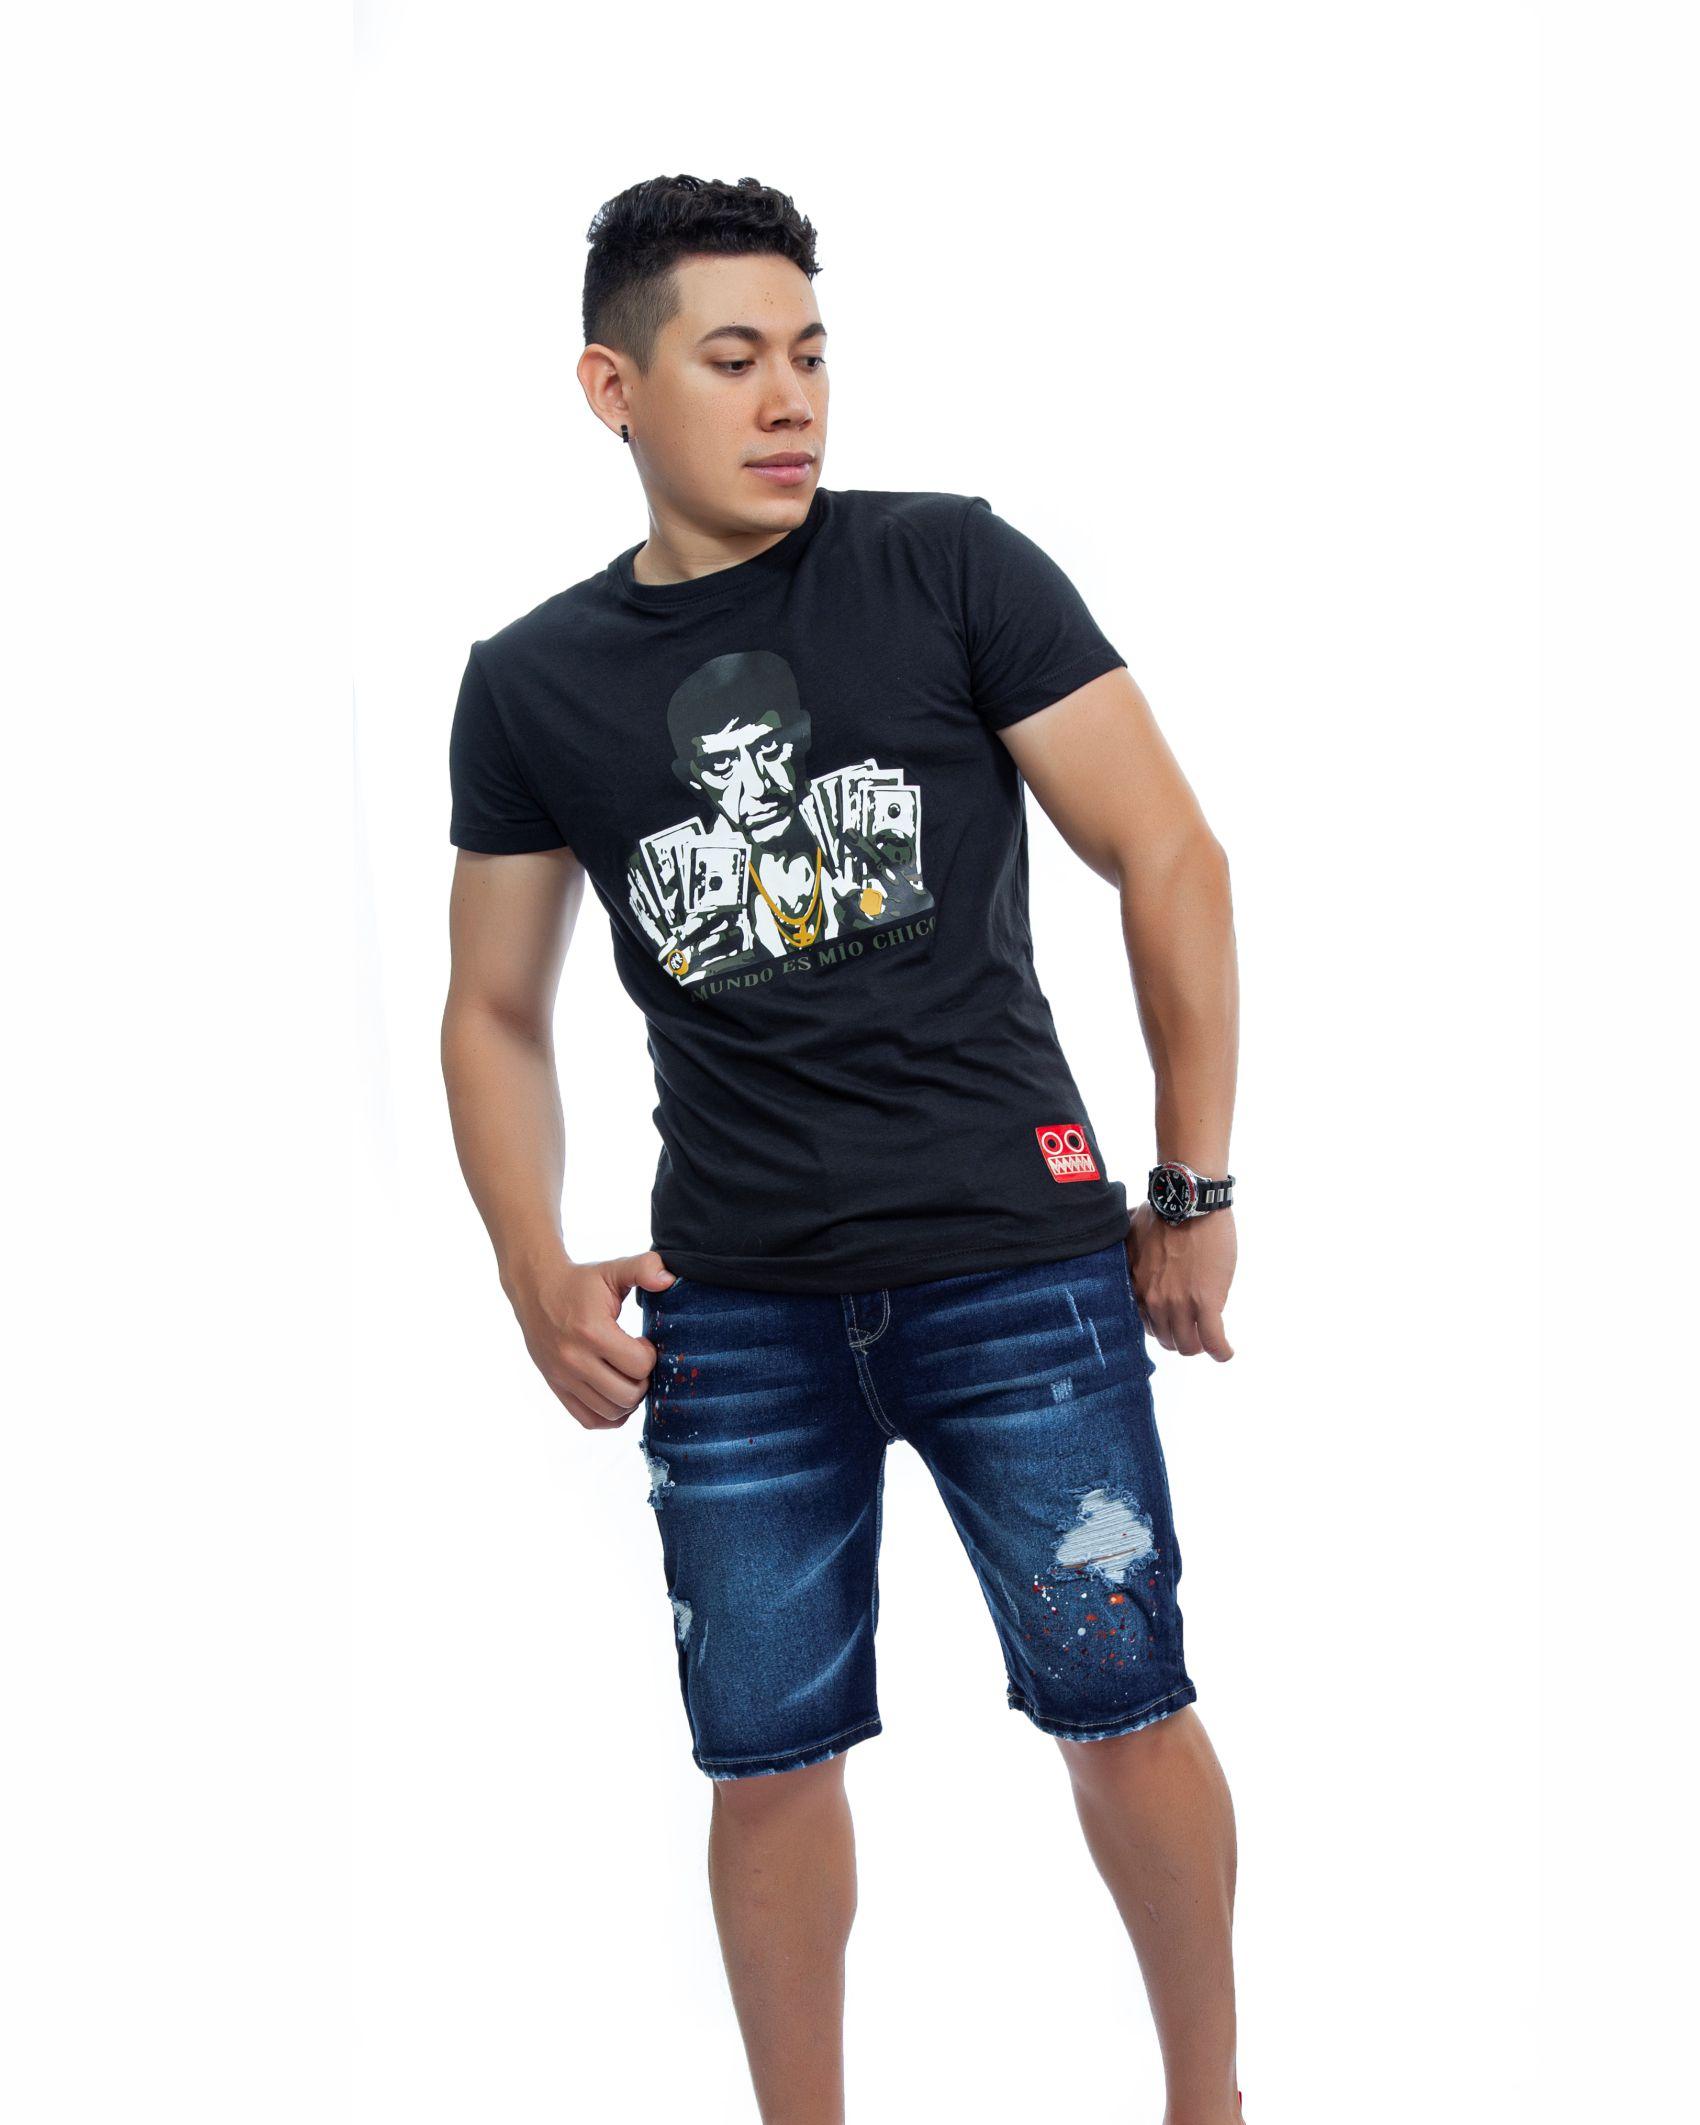 ref 1750 1 camiseta tony dolar, color negro , tela 100% en algodon Tallas S-M-L-XL. $48.000.